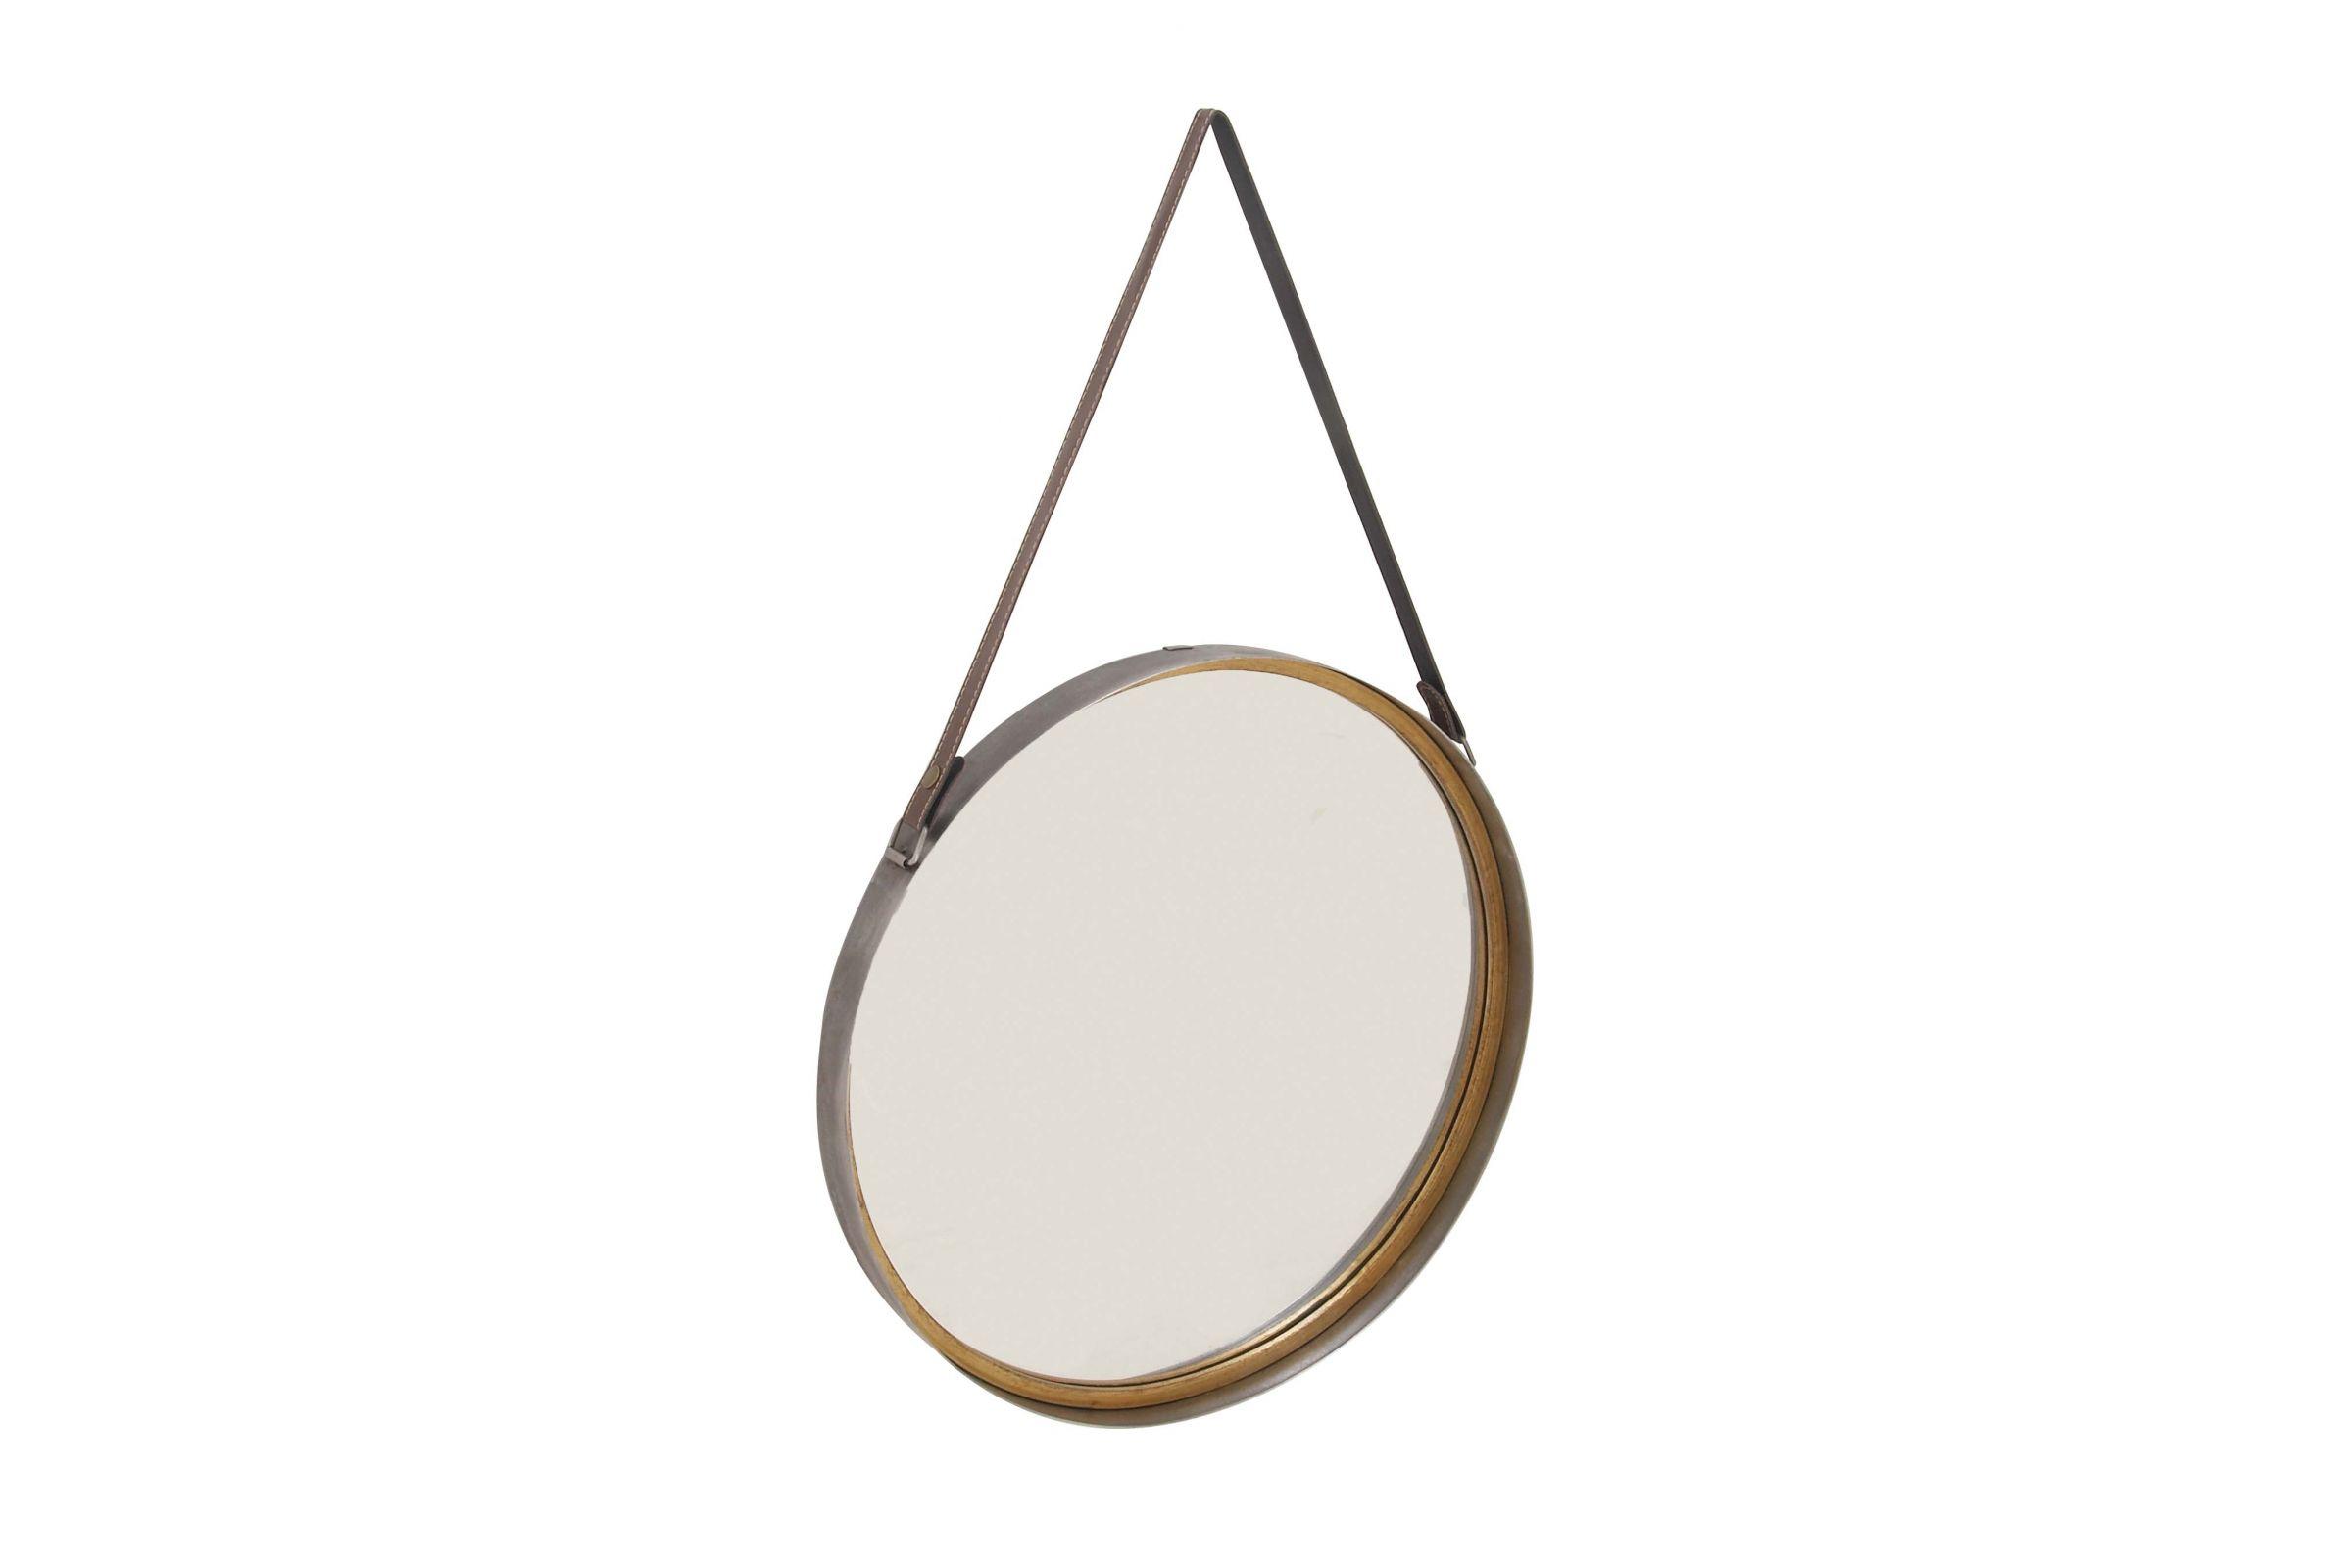 Modern Reflections Round Hanging Wall Mirror By Uma At Gardner White